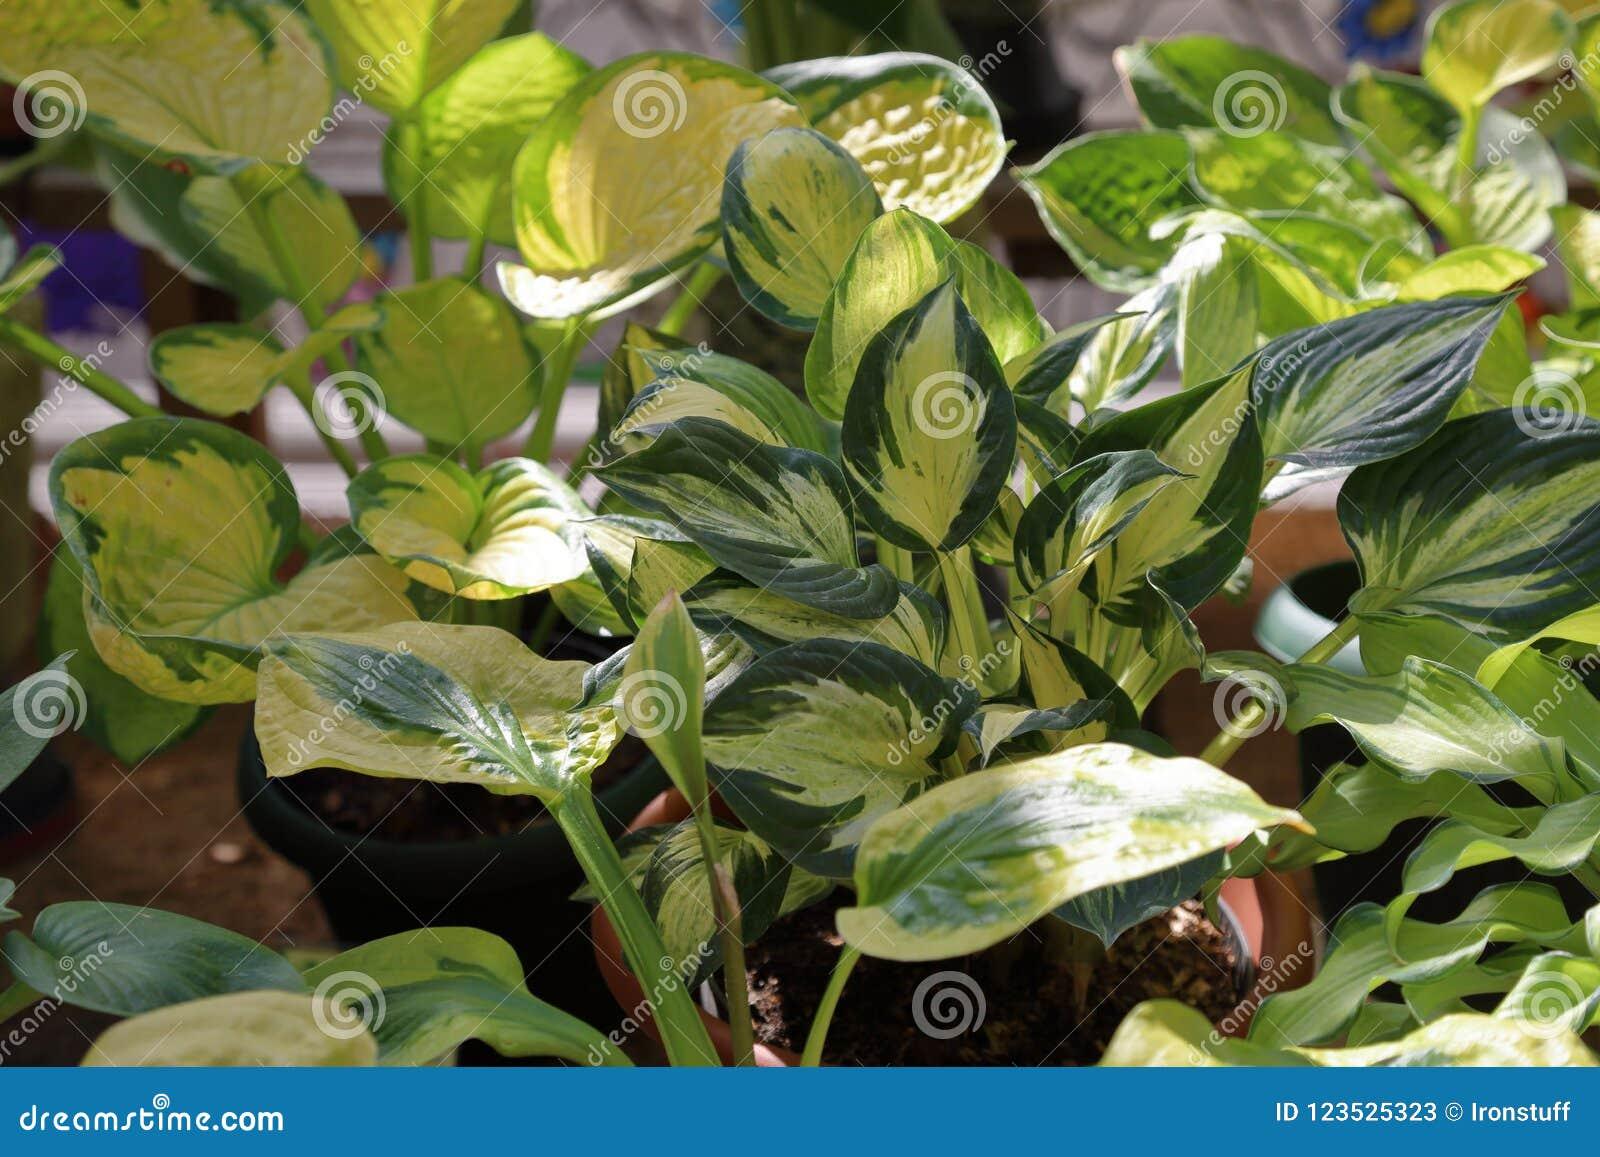 Perennial Plant Hosta Stock Image Image Of Yard Perennial 123525323